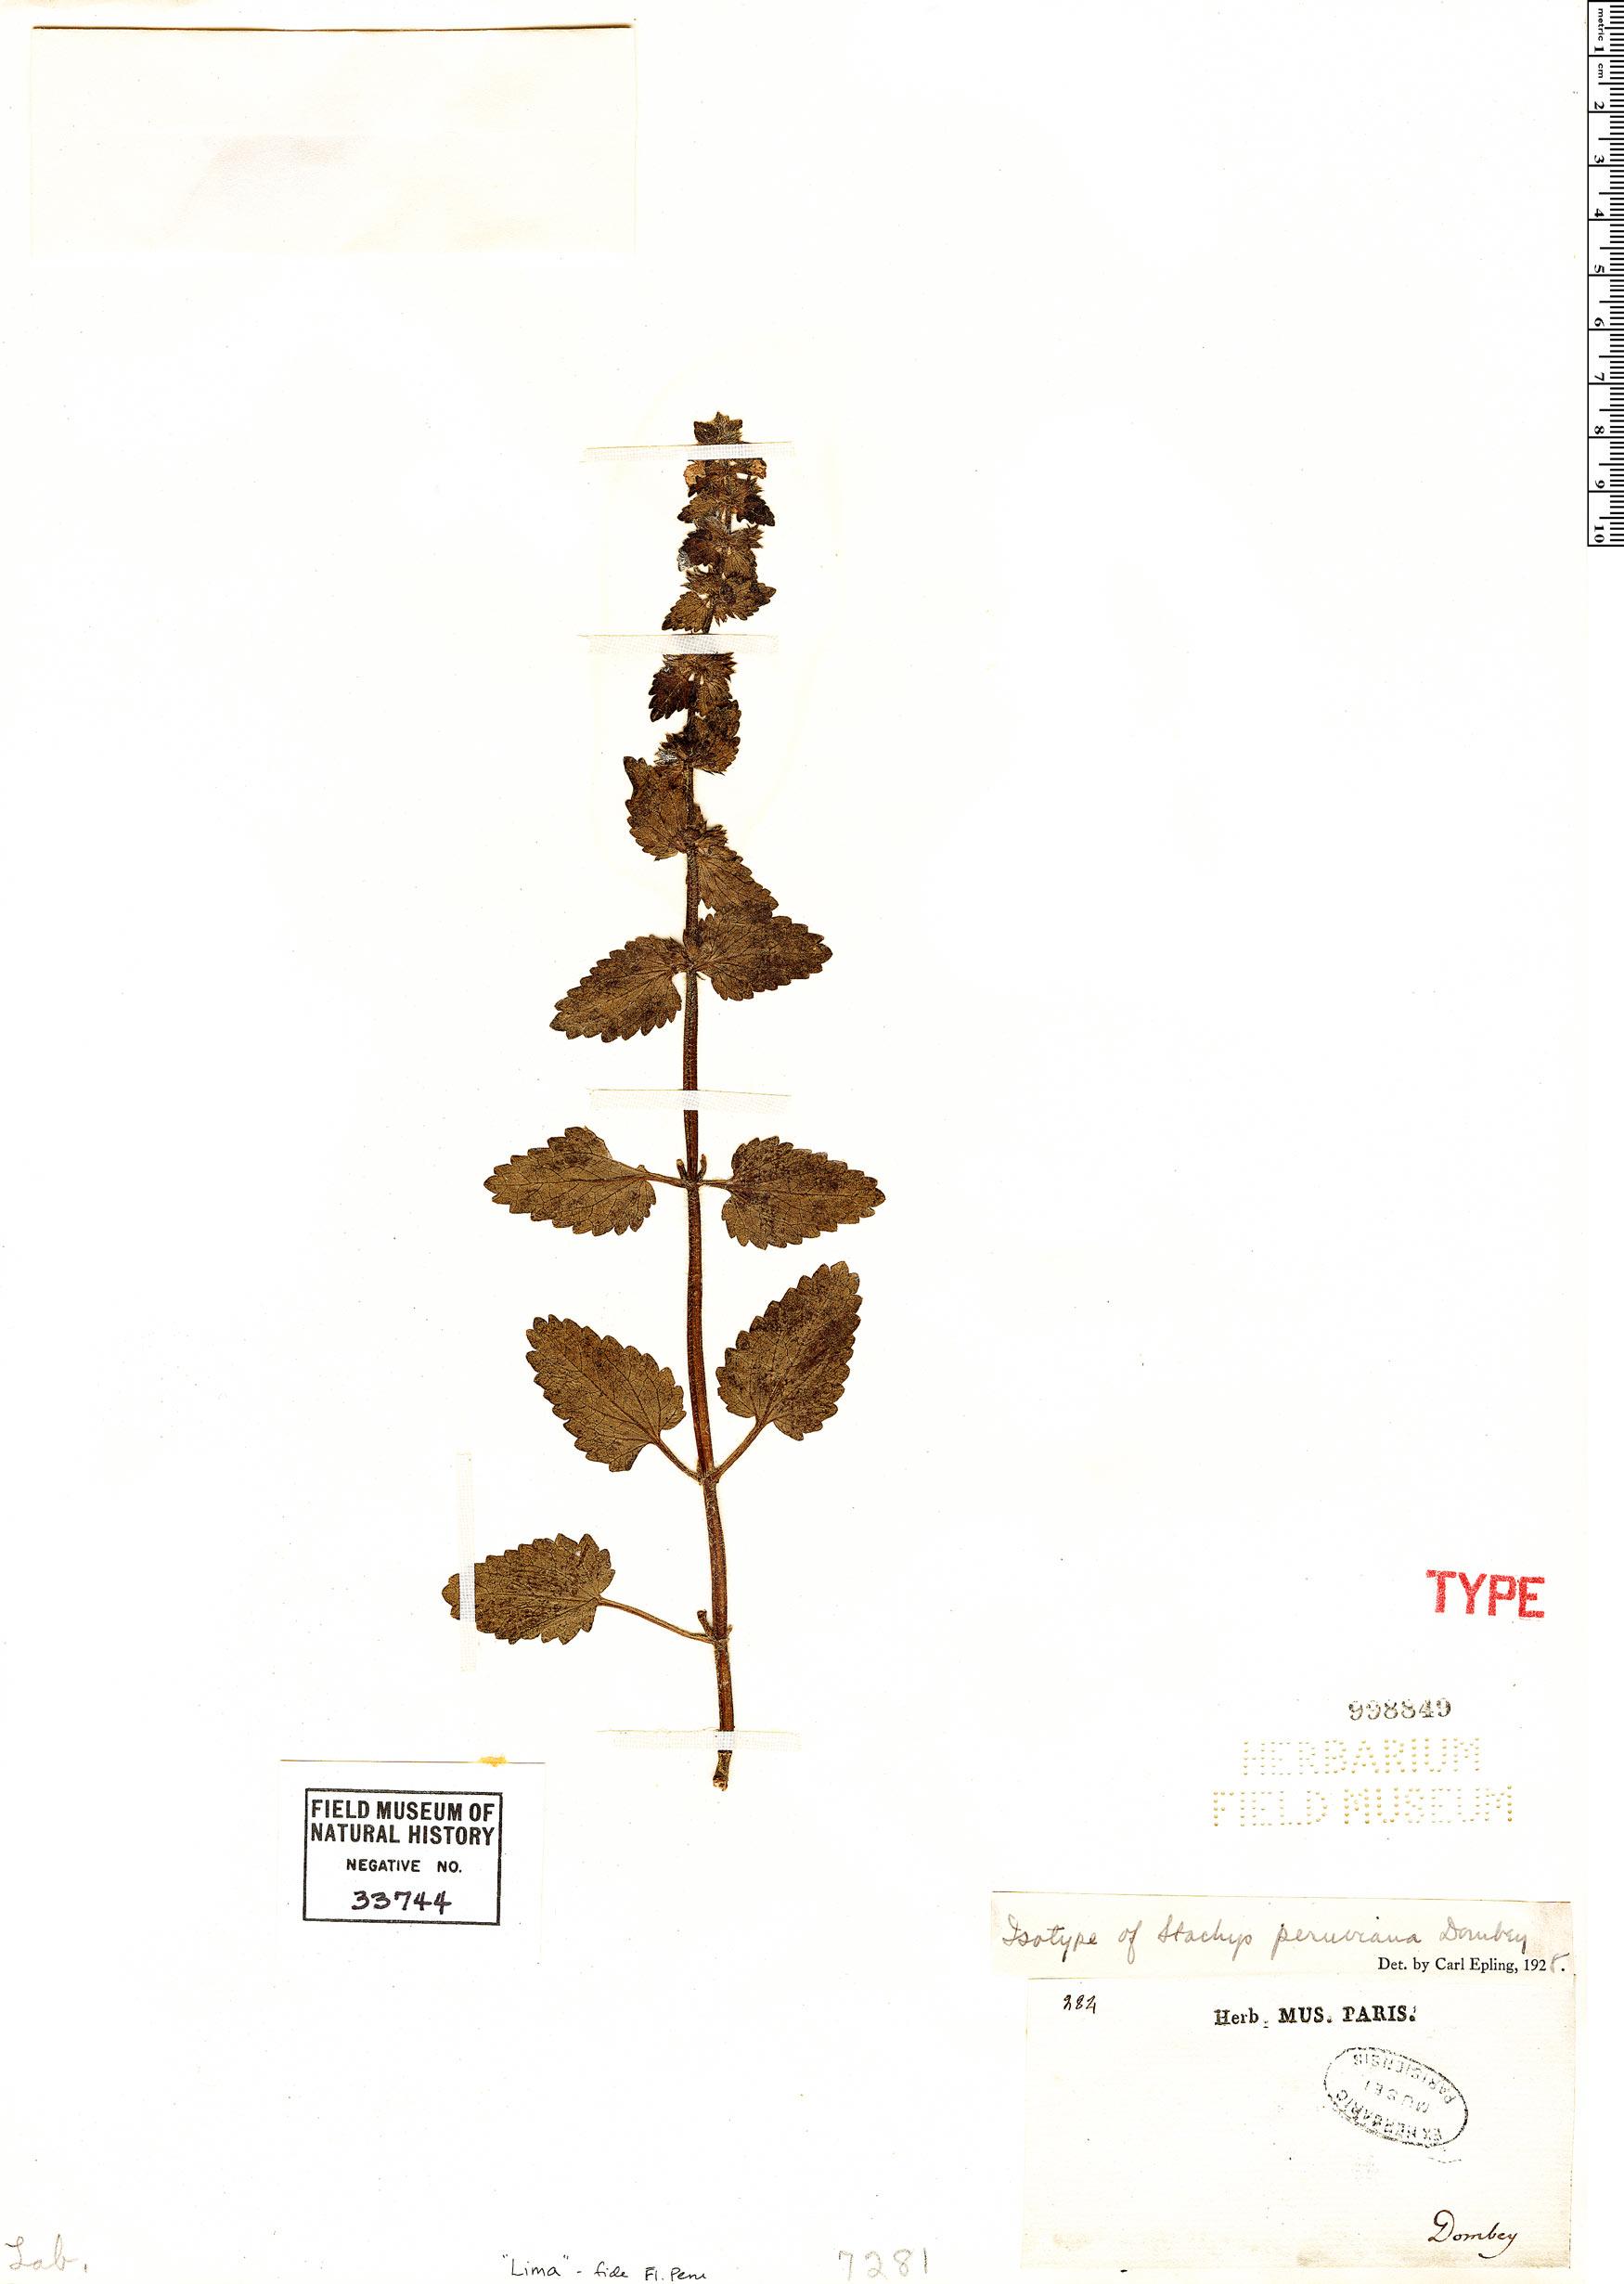 Specimen: Stachys peruviana